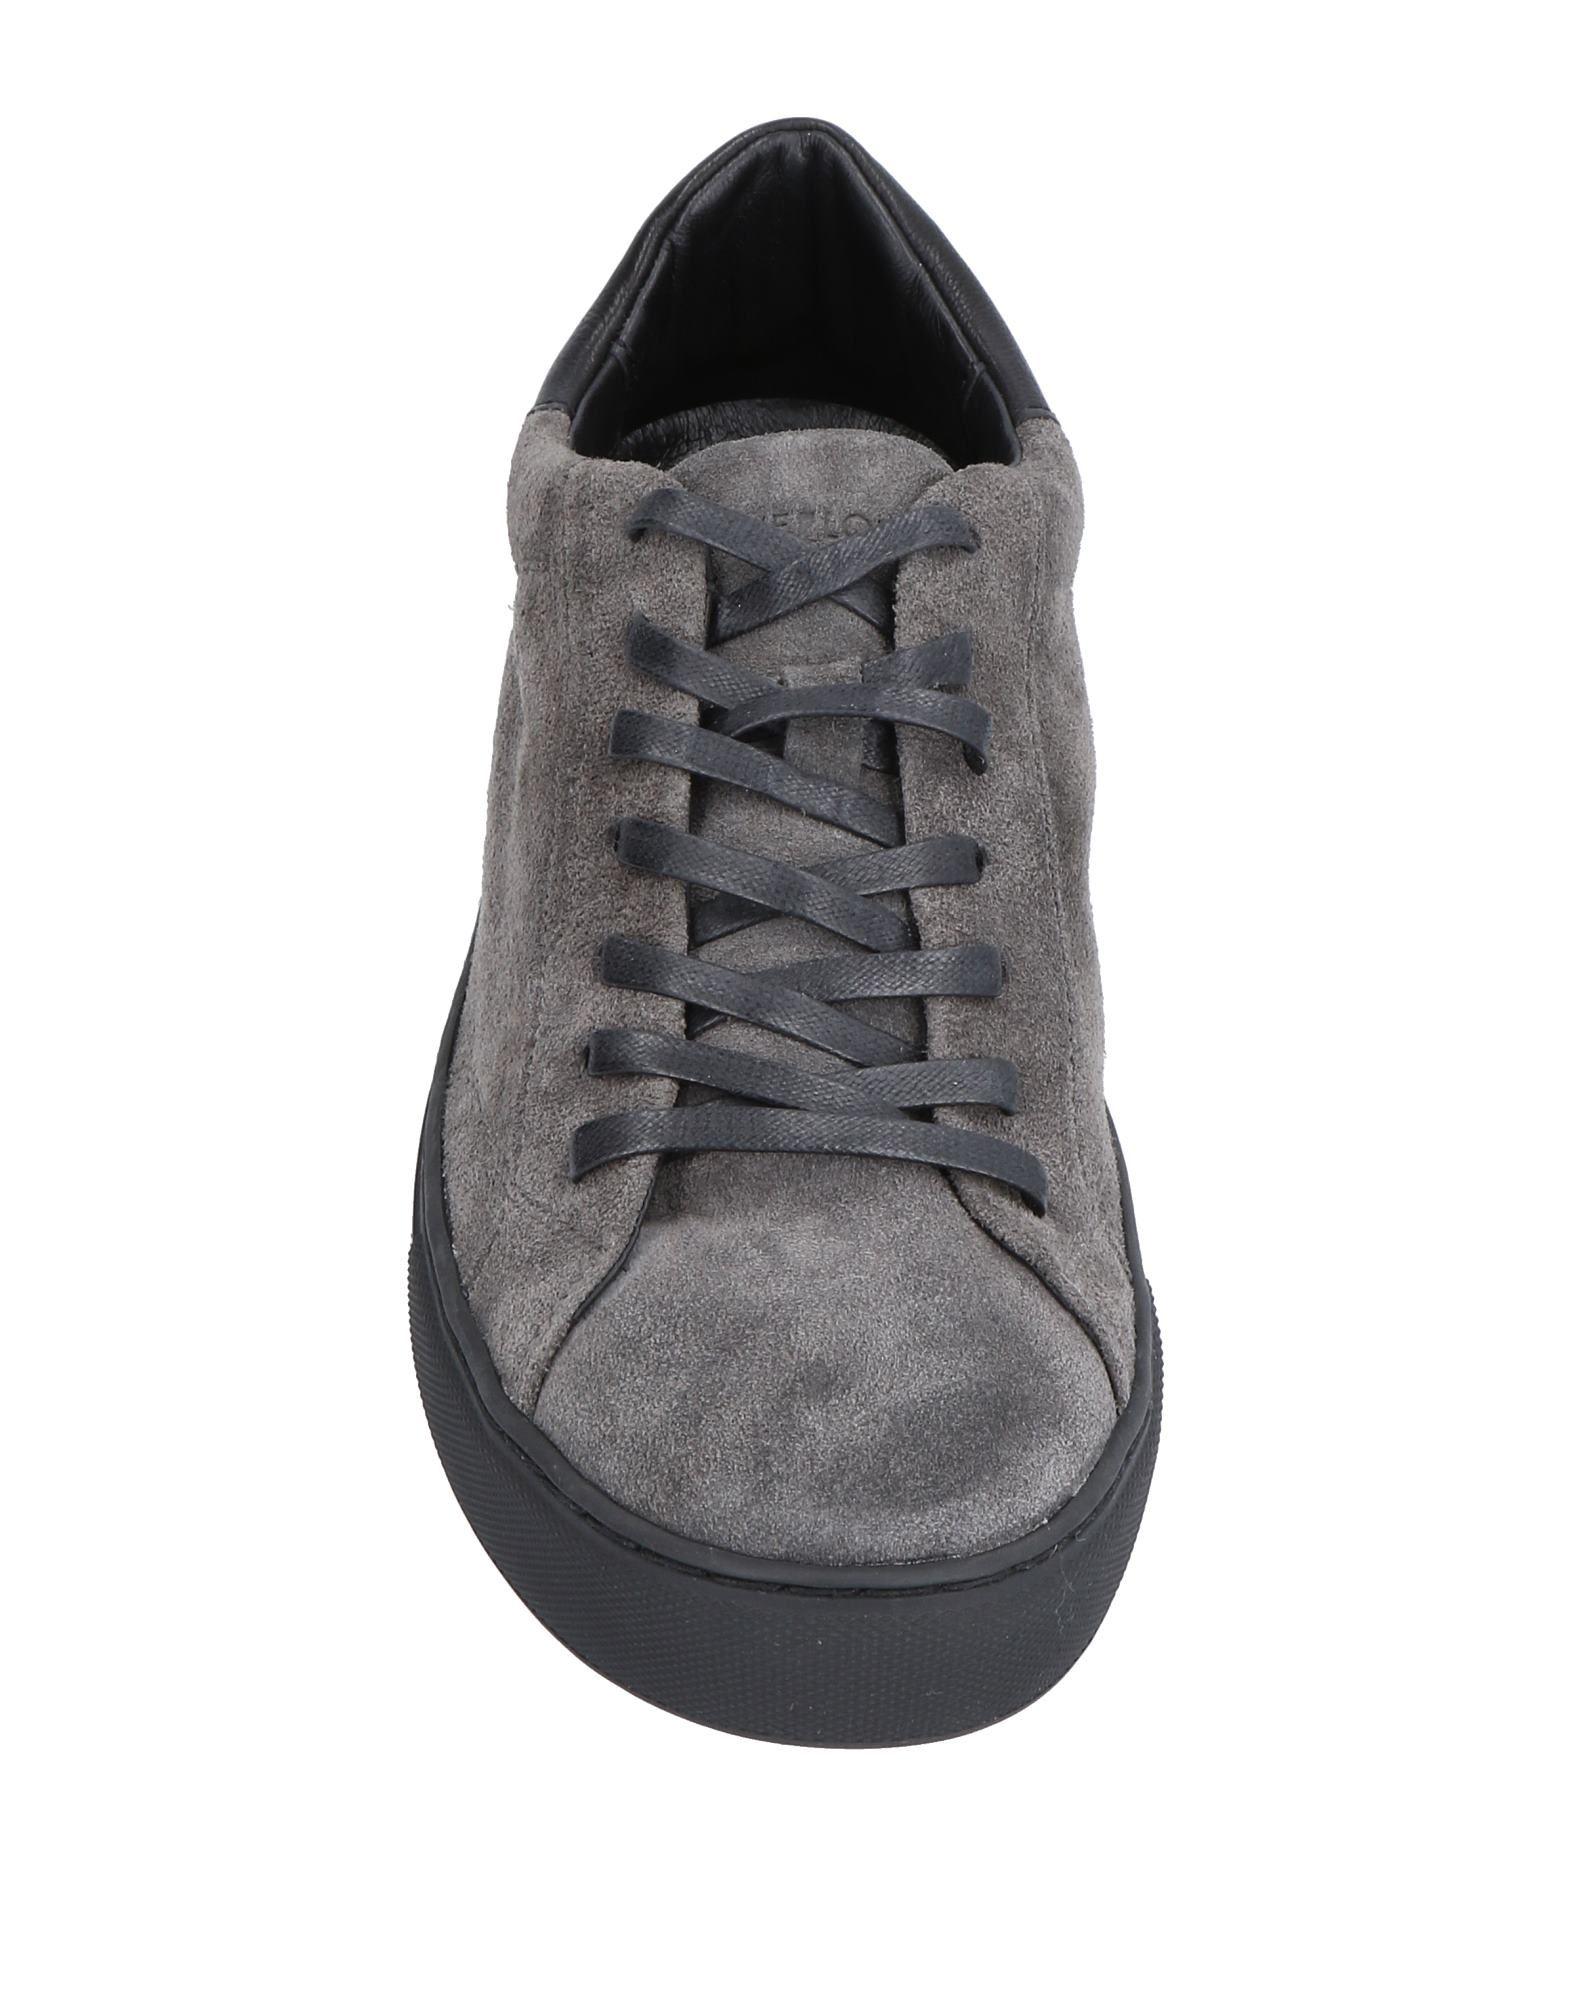 Rabatt echte Herren Schuhe Crime London Sneakers Herren echte  11499060LI 8dd49b